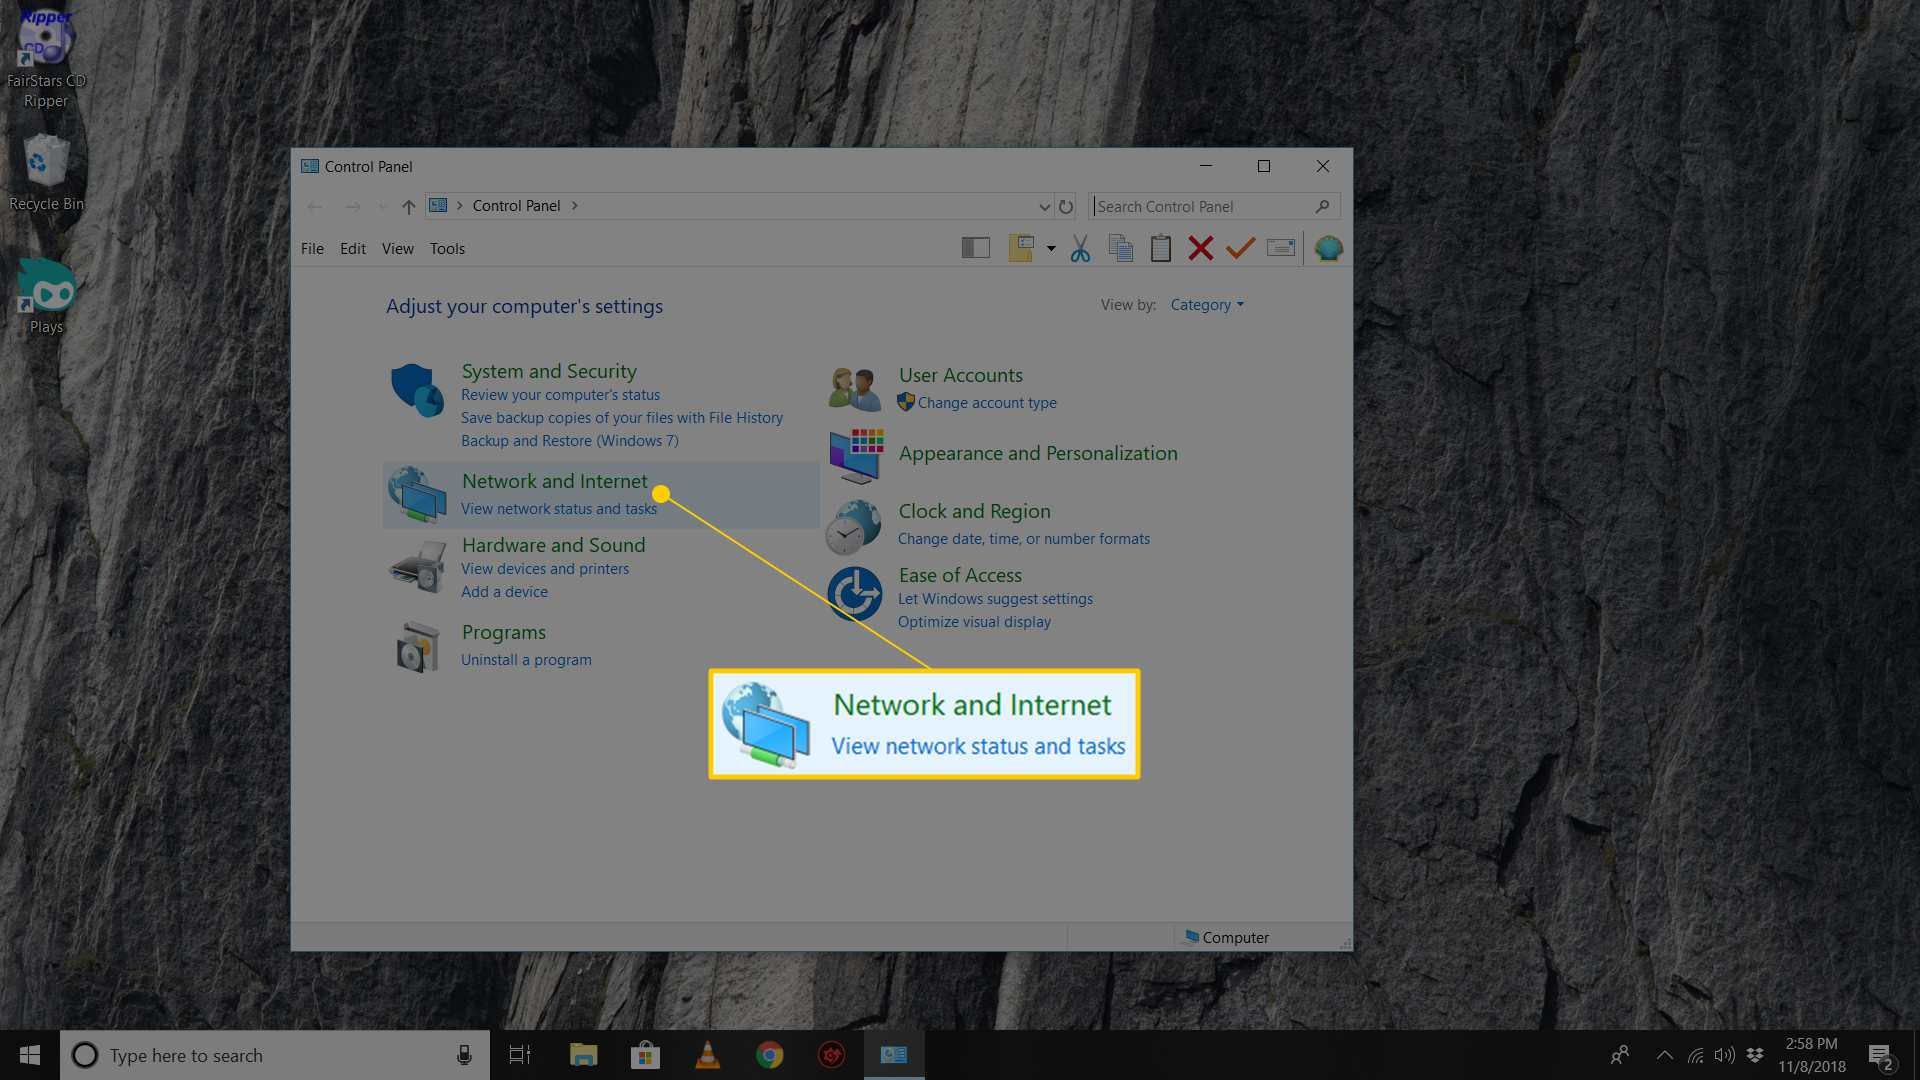 Activate Full Screen Mode in Internet Explorer 11